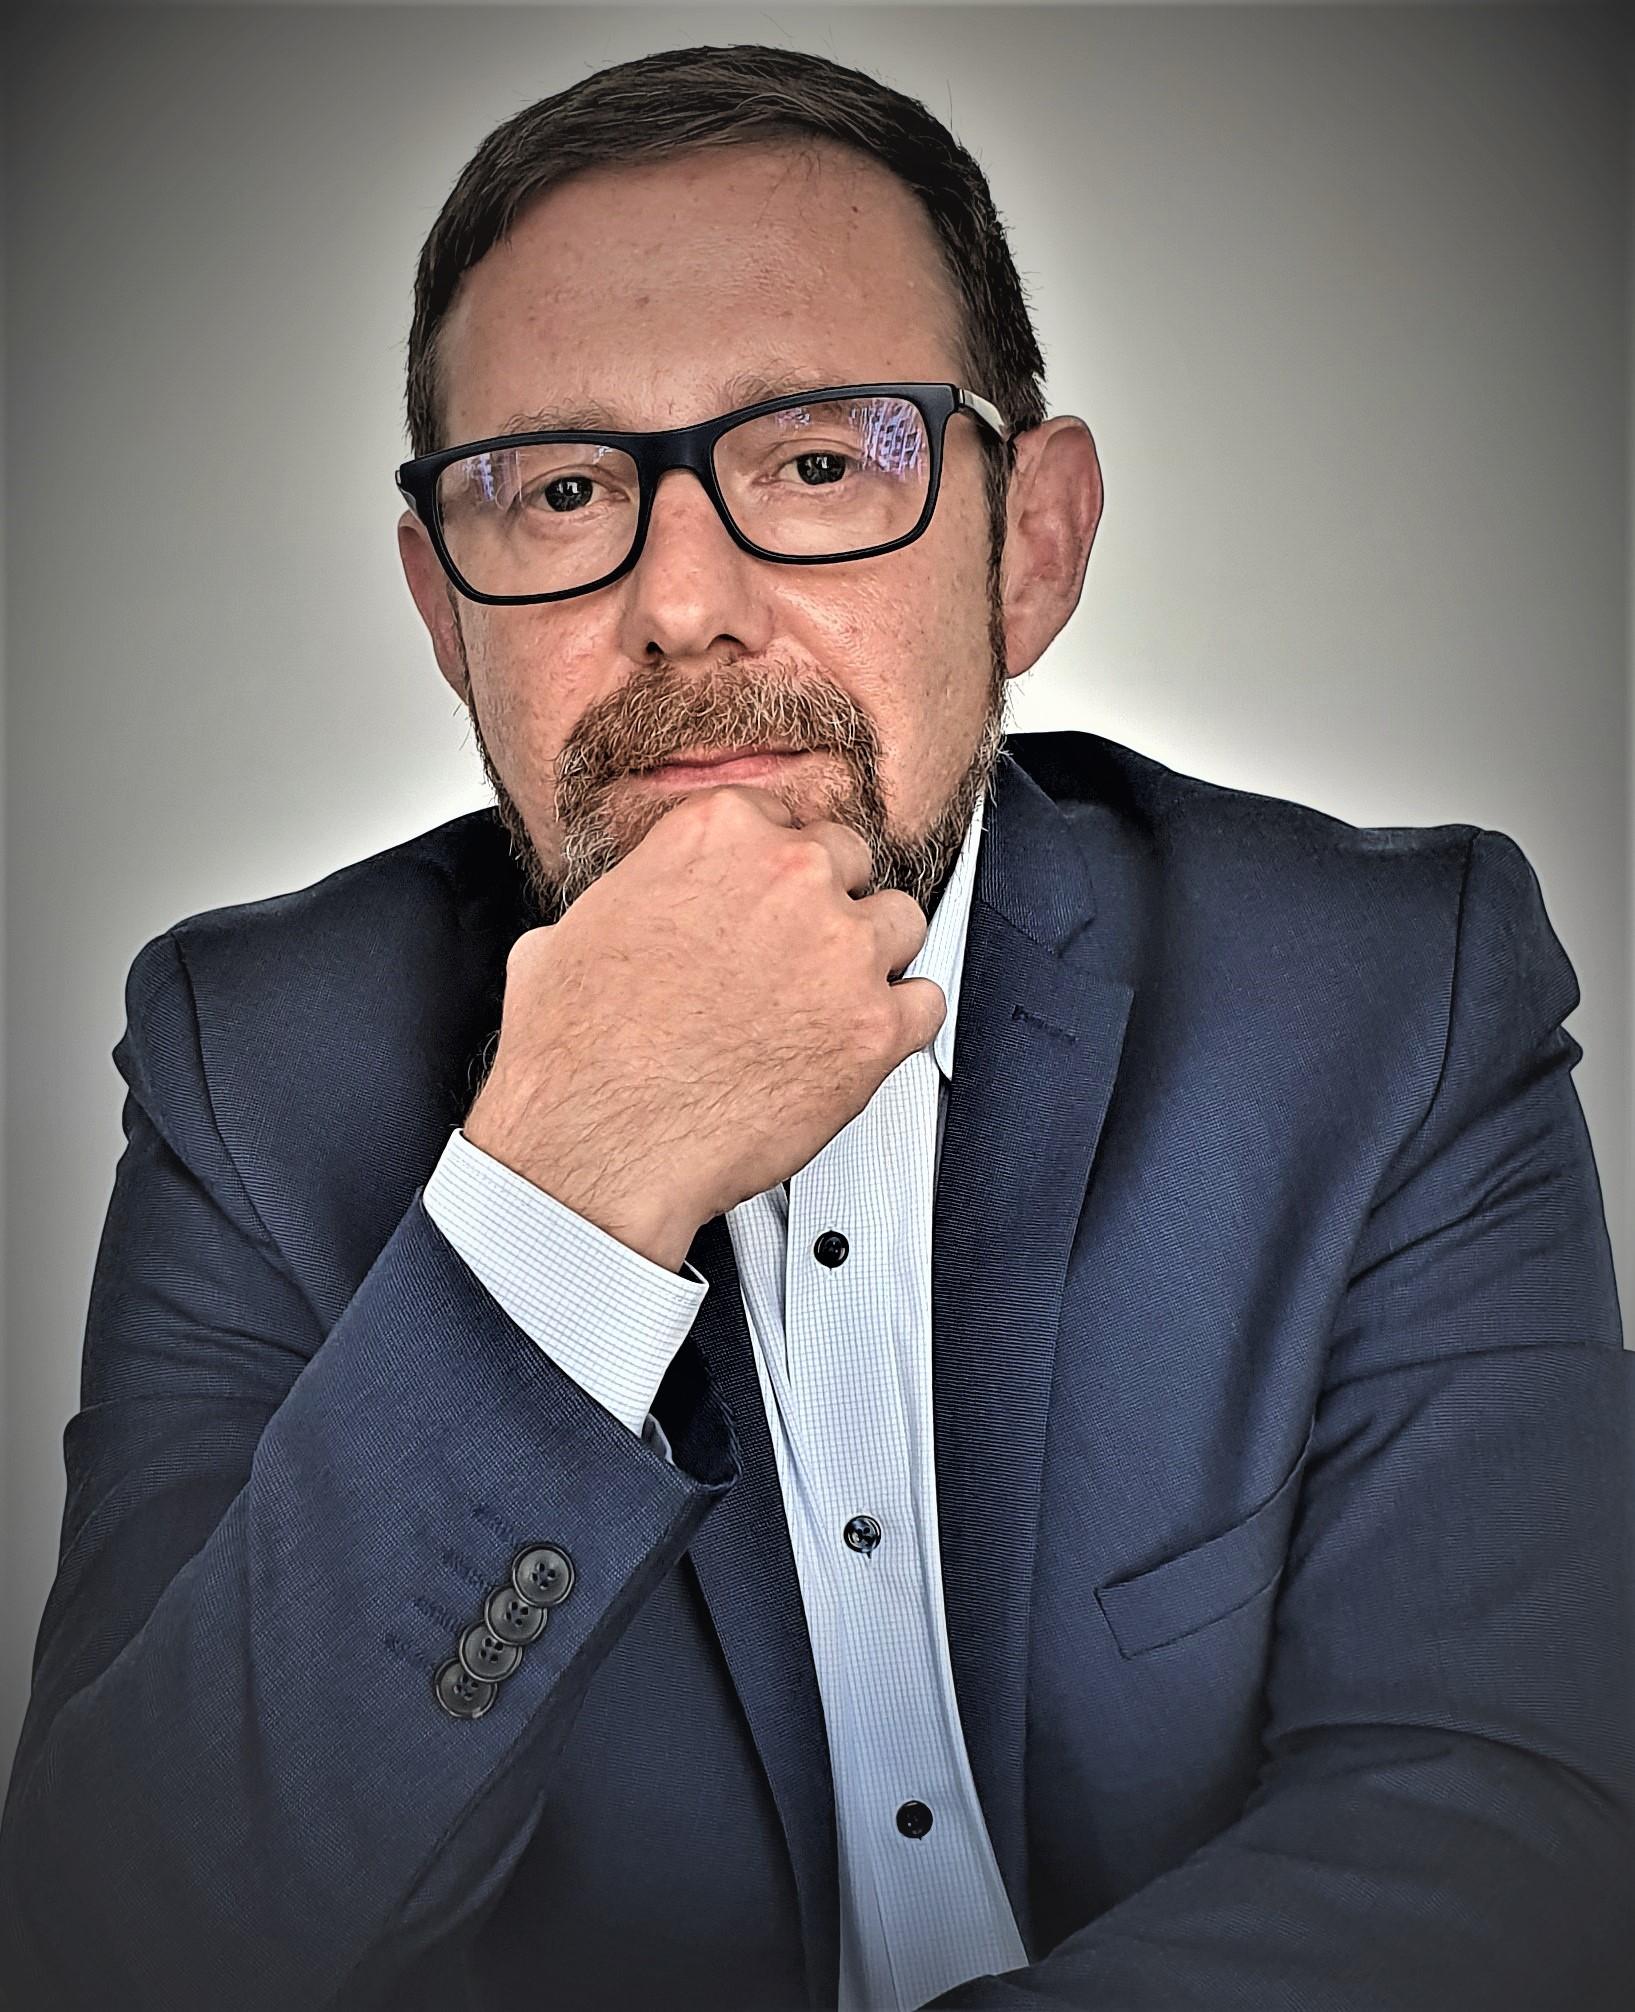 Tomasz Lichota